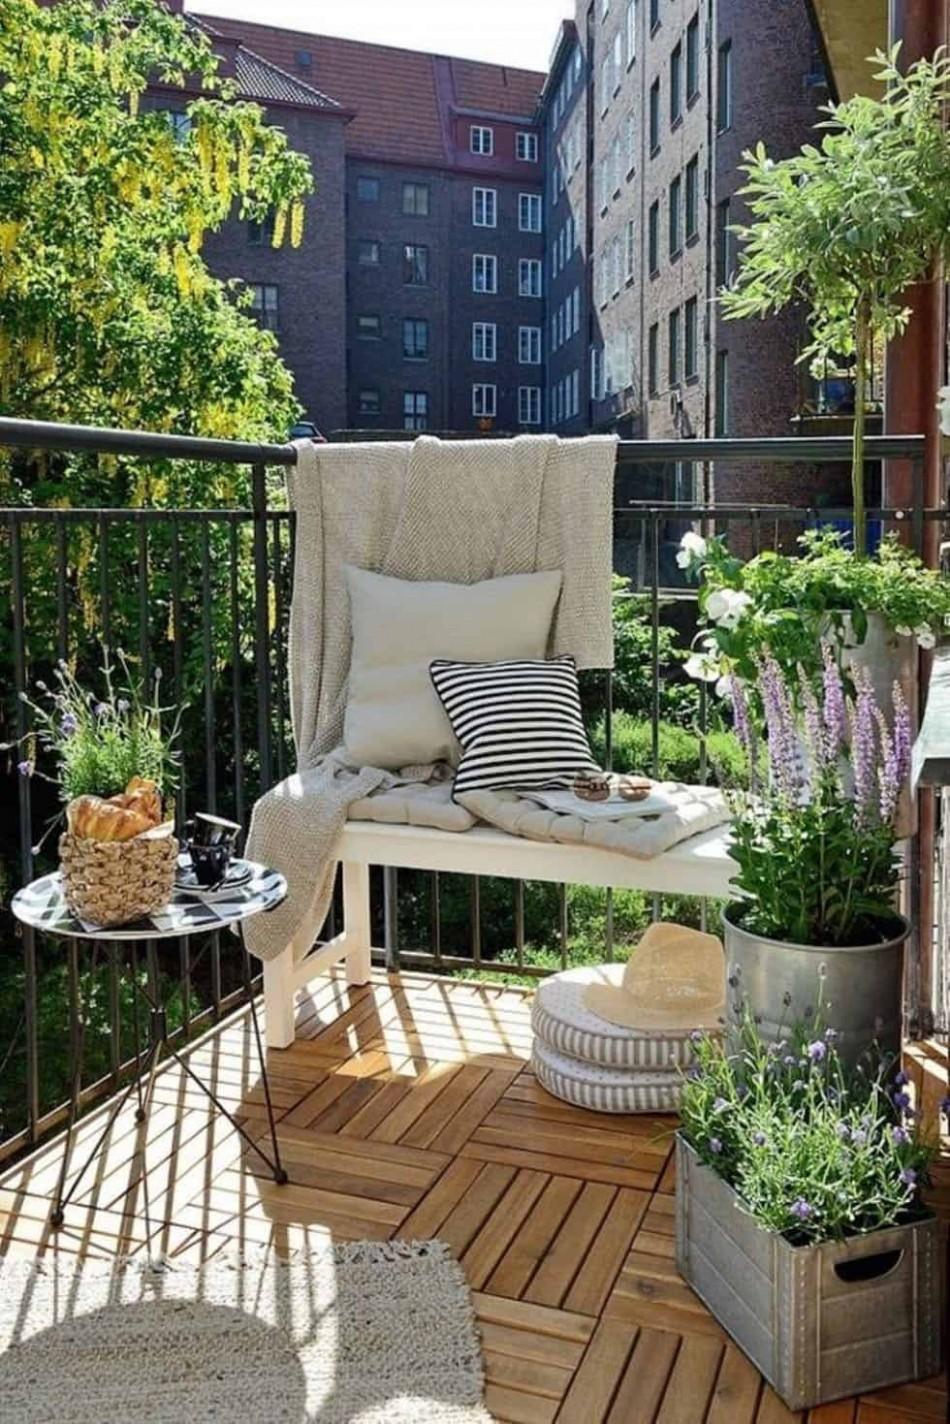 10 Super cool and breezy small balcony design ideas - Balcony Ideas Apartment